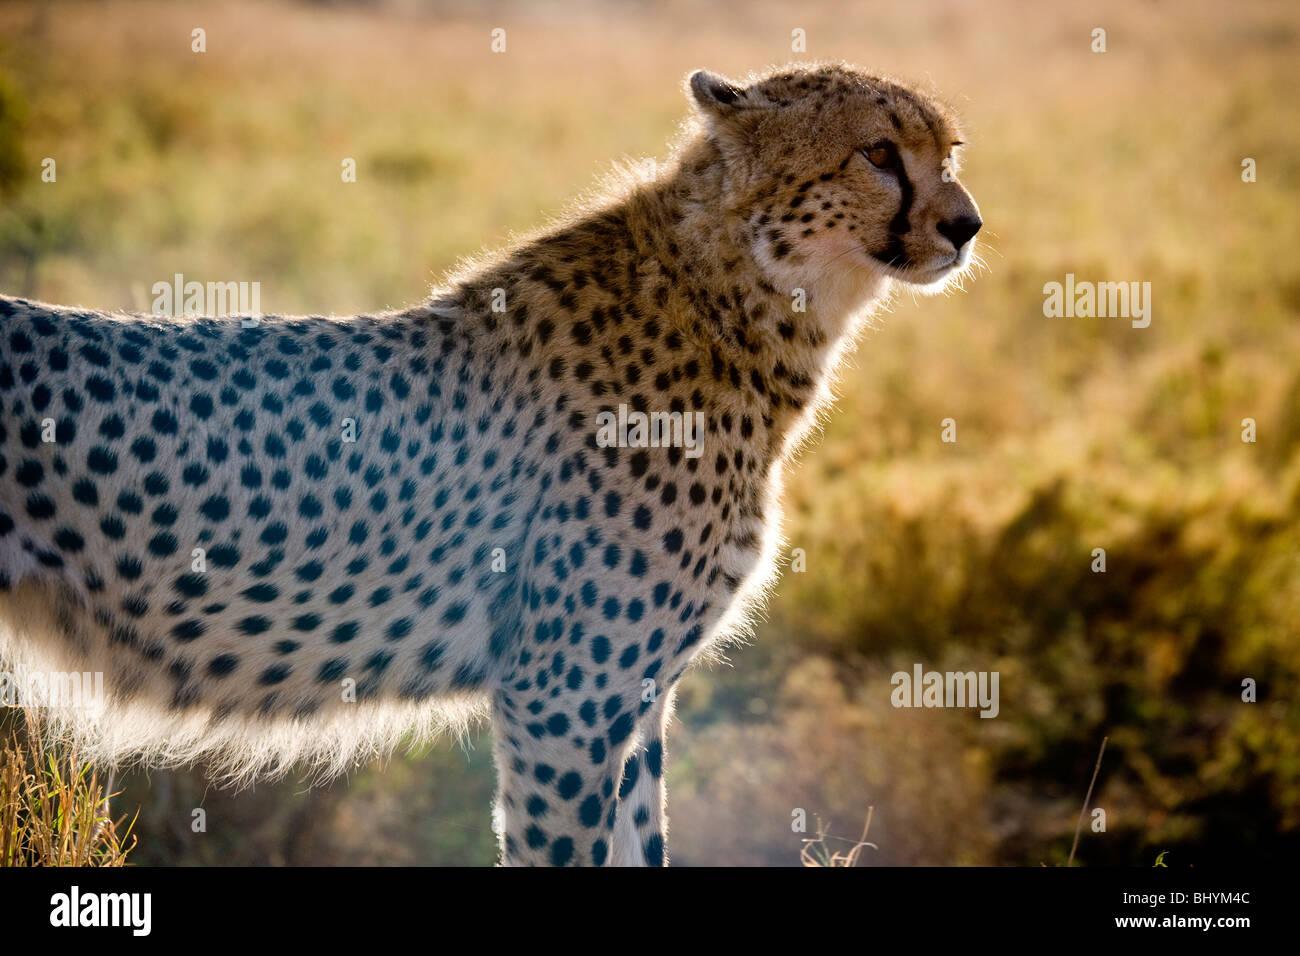 Cheetah on the hunt, Serengeti NP, Tanzania, East Africa - Stock Image